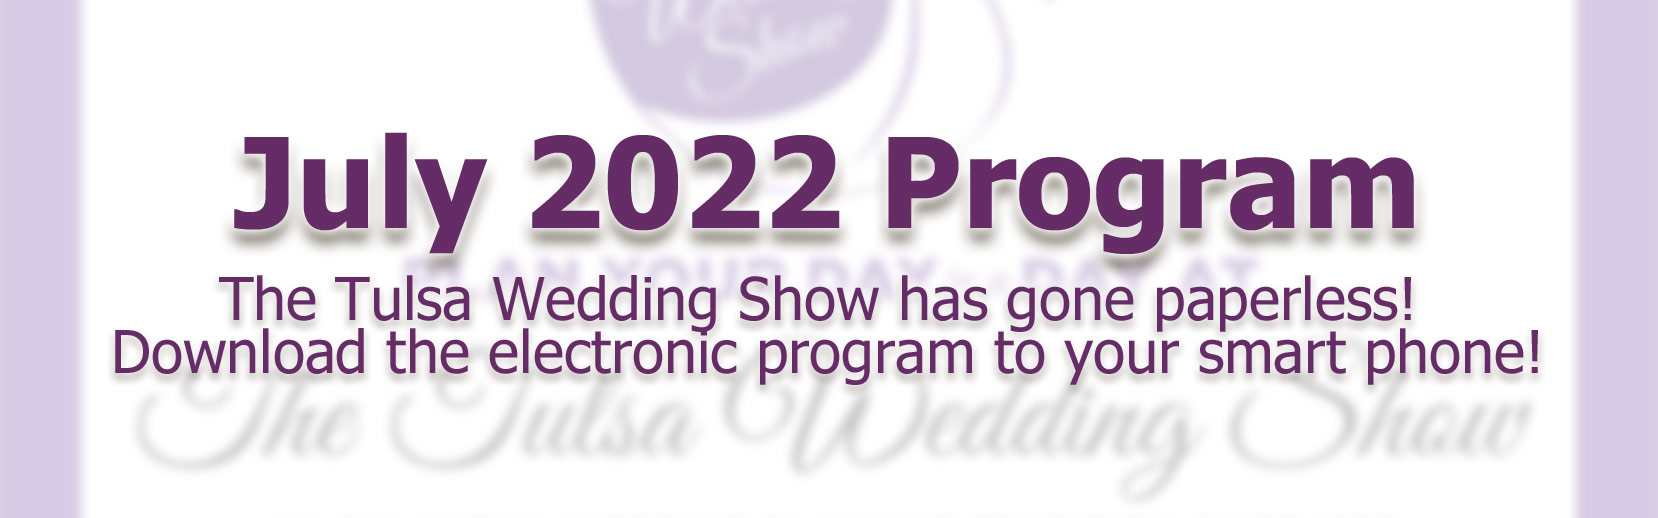 Ticket Sales / The Tulsa Wedding Show / Eastern Oklahoma's Largest